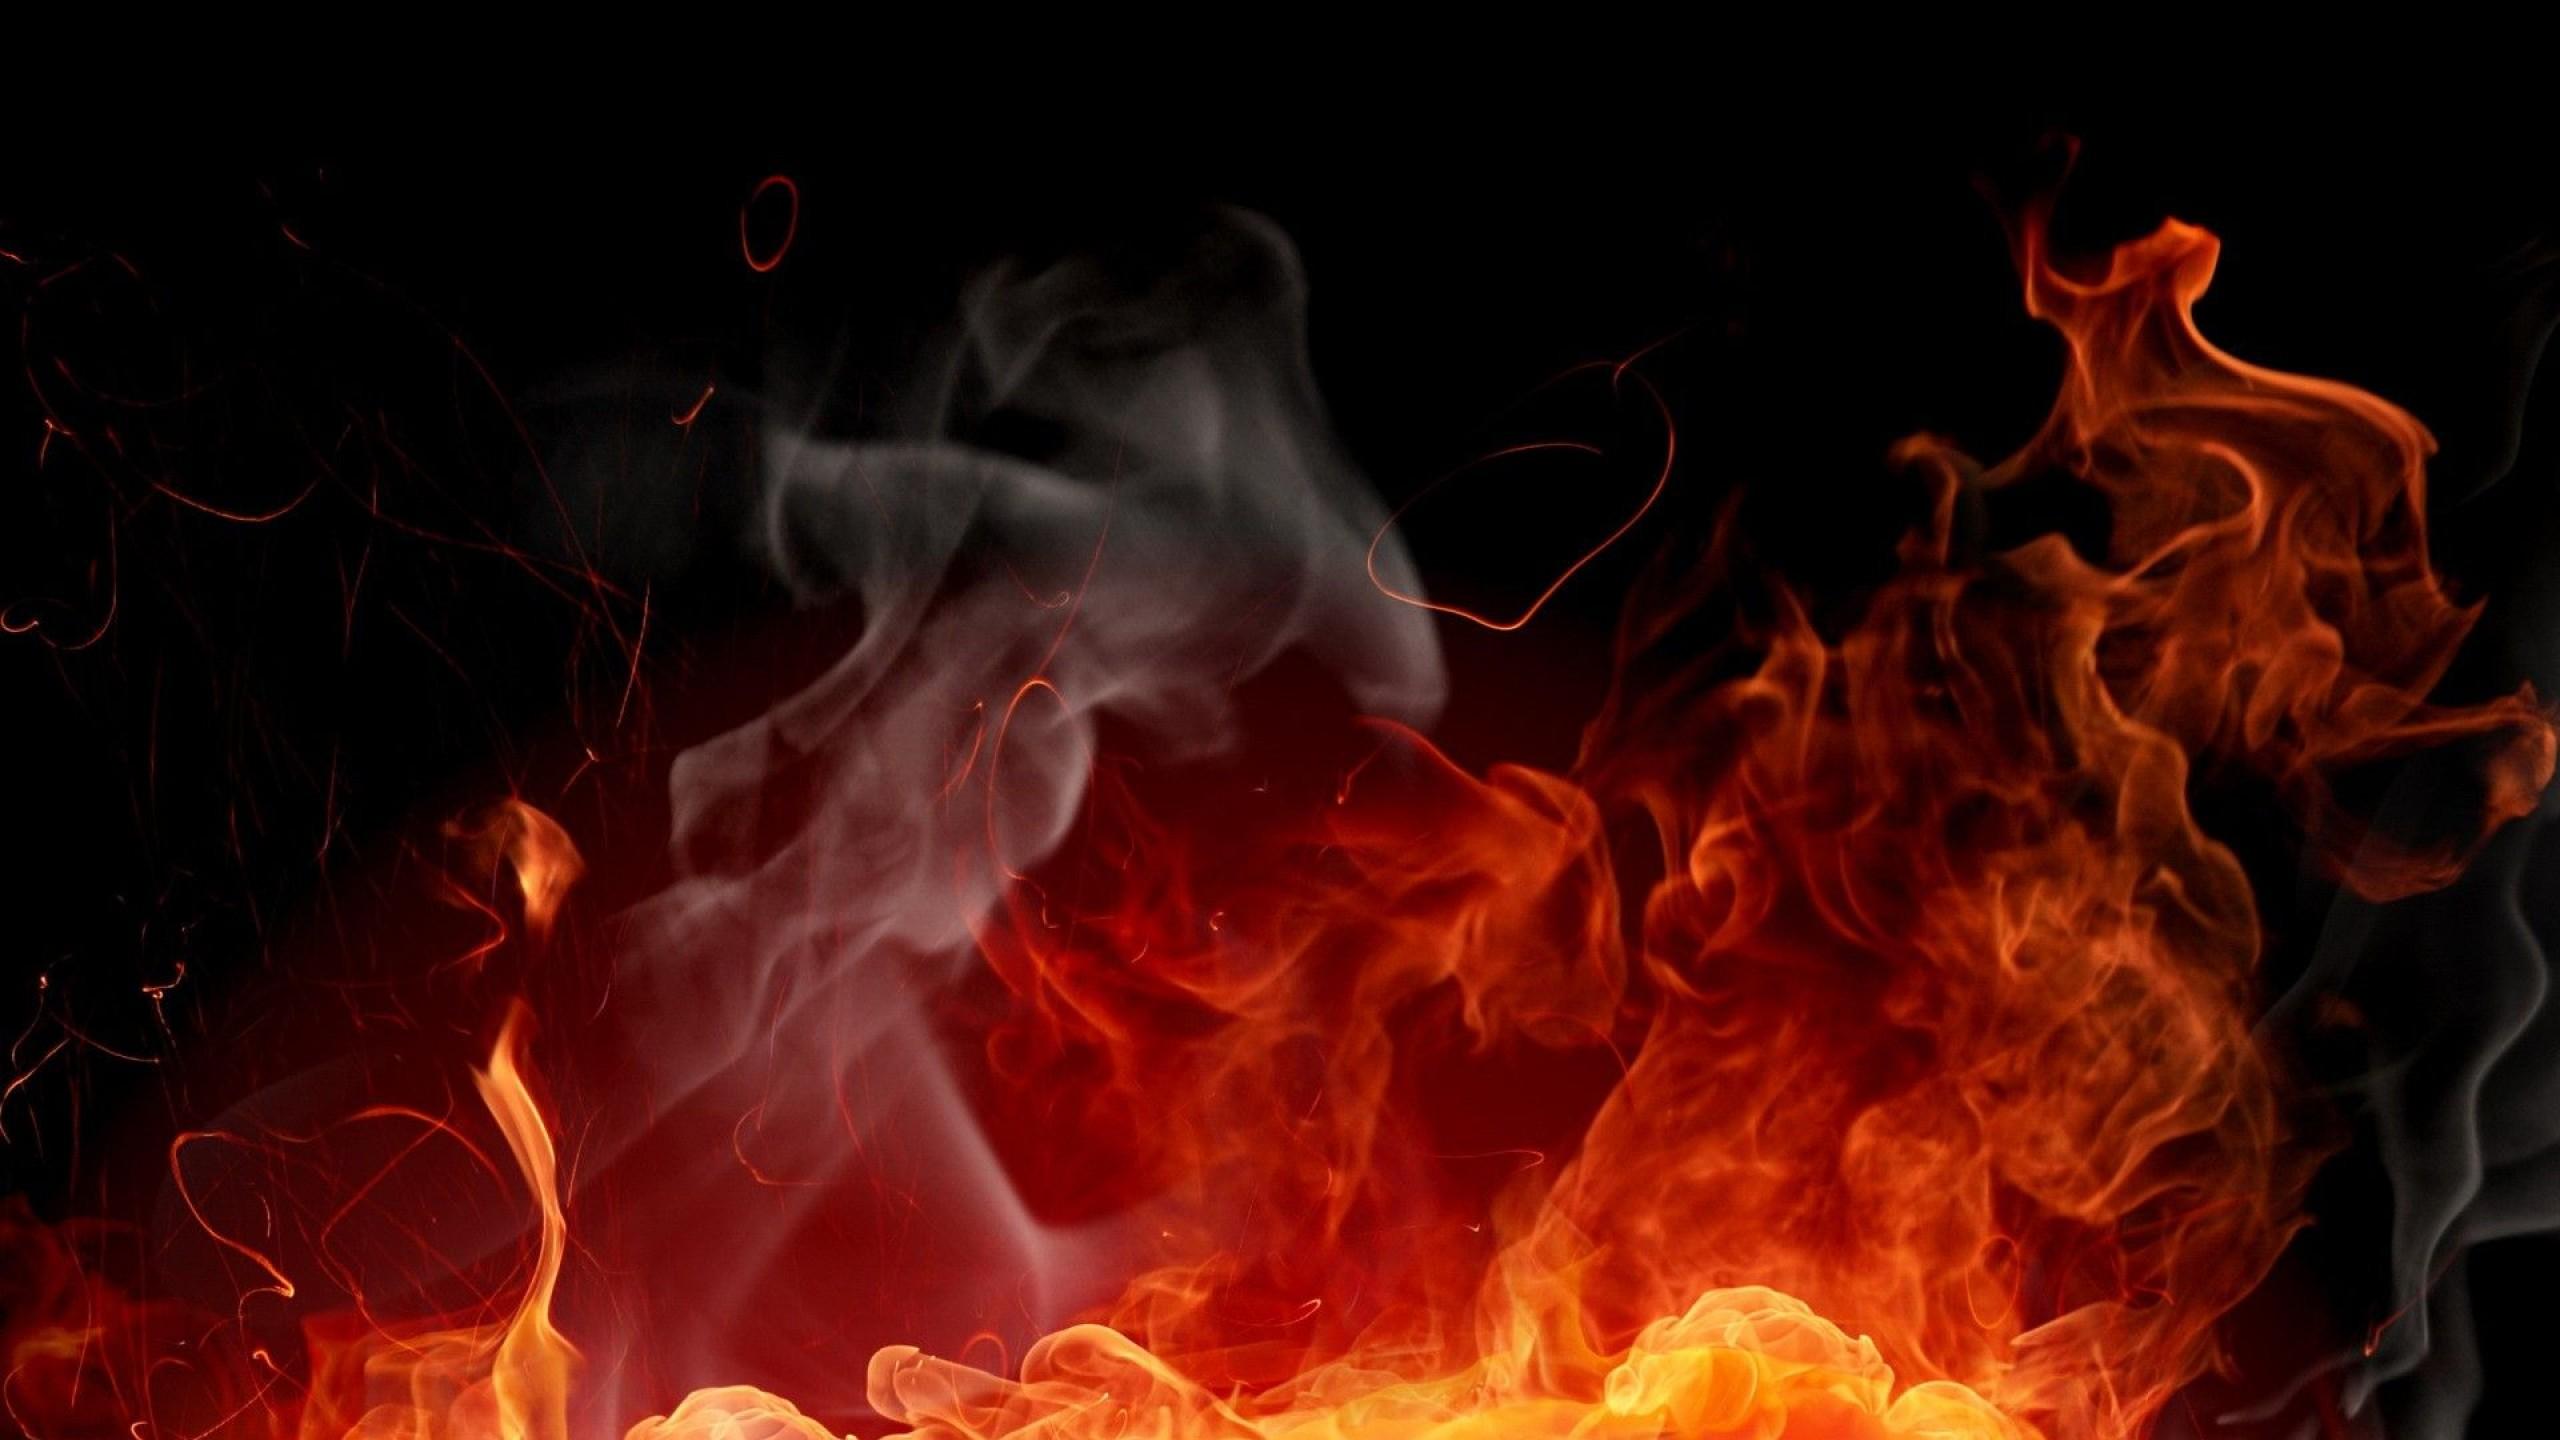 Fire Flames #6985696